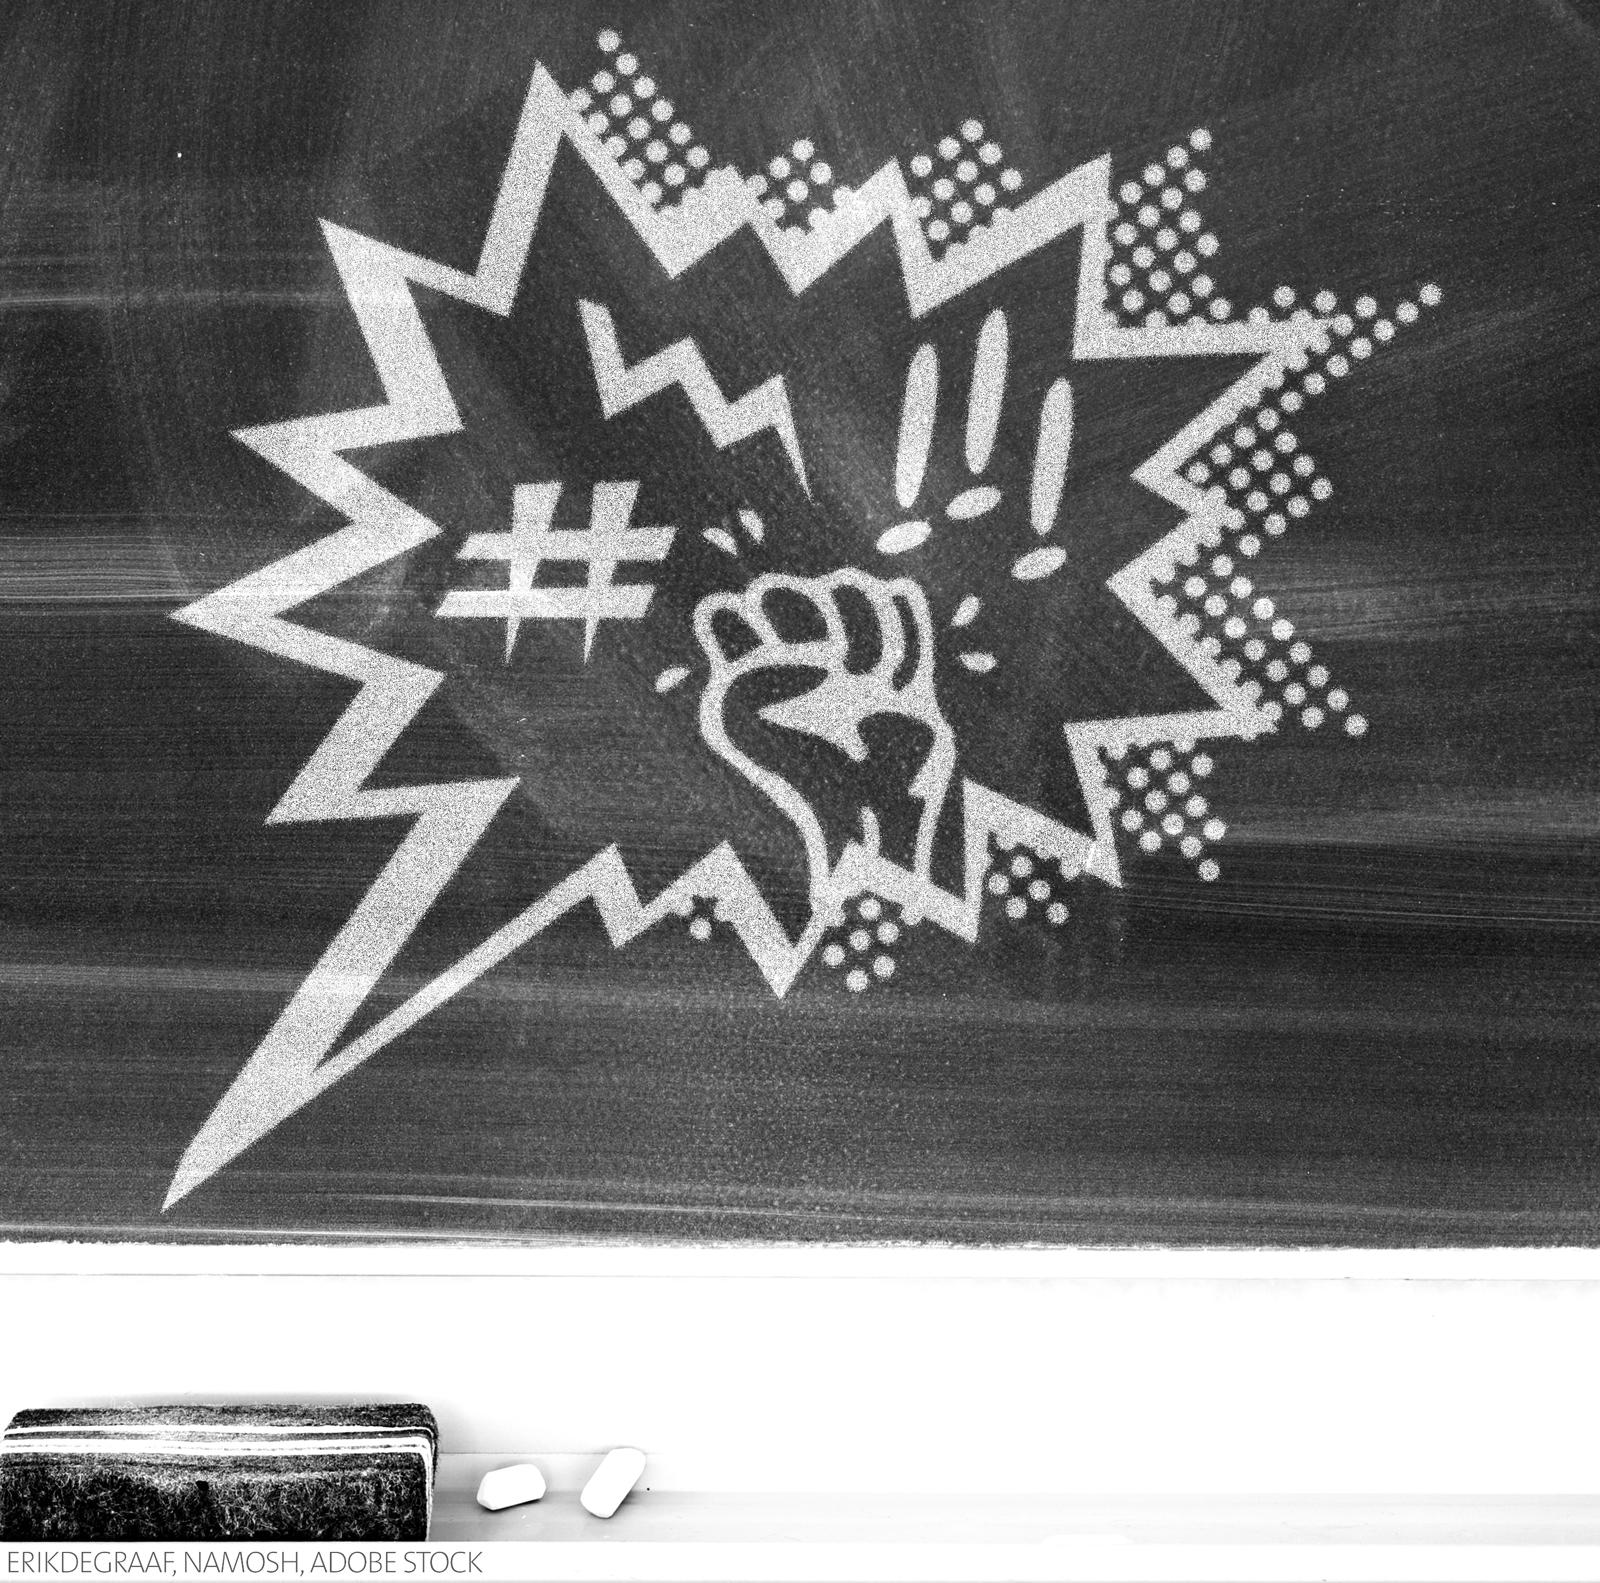 Aktuelles zum Lehrermangel